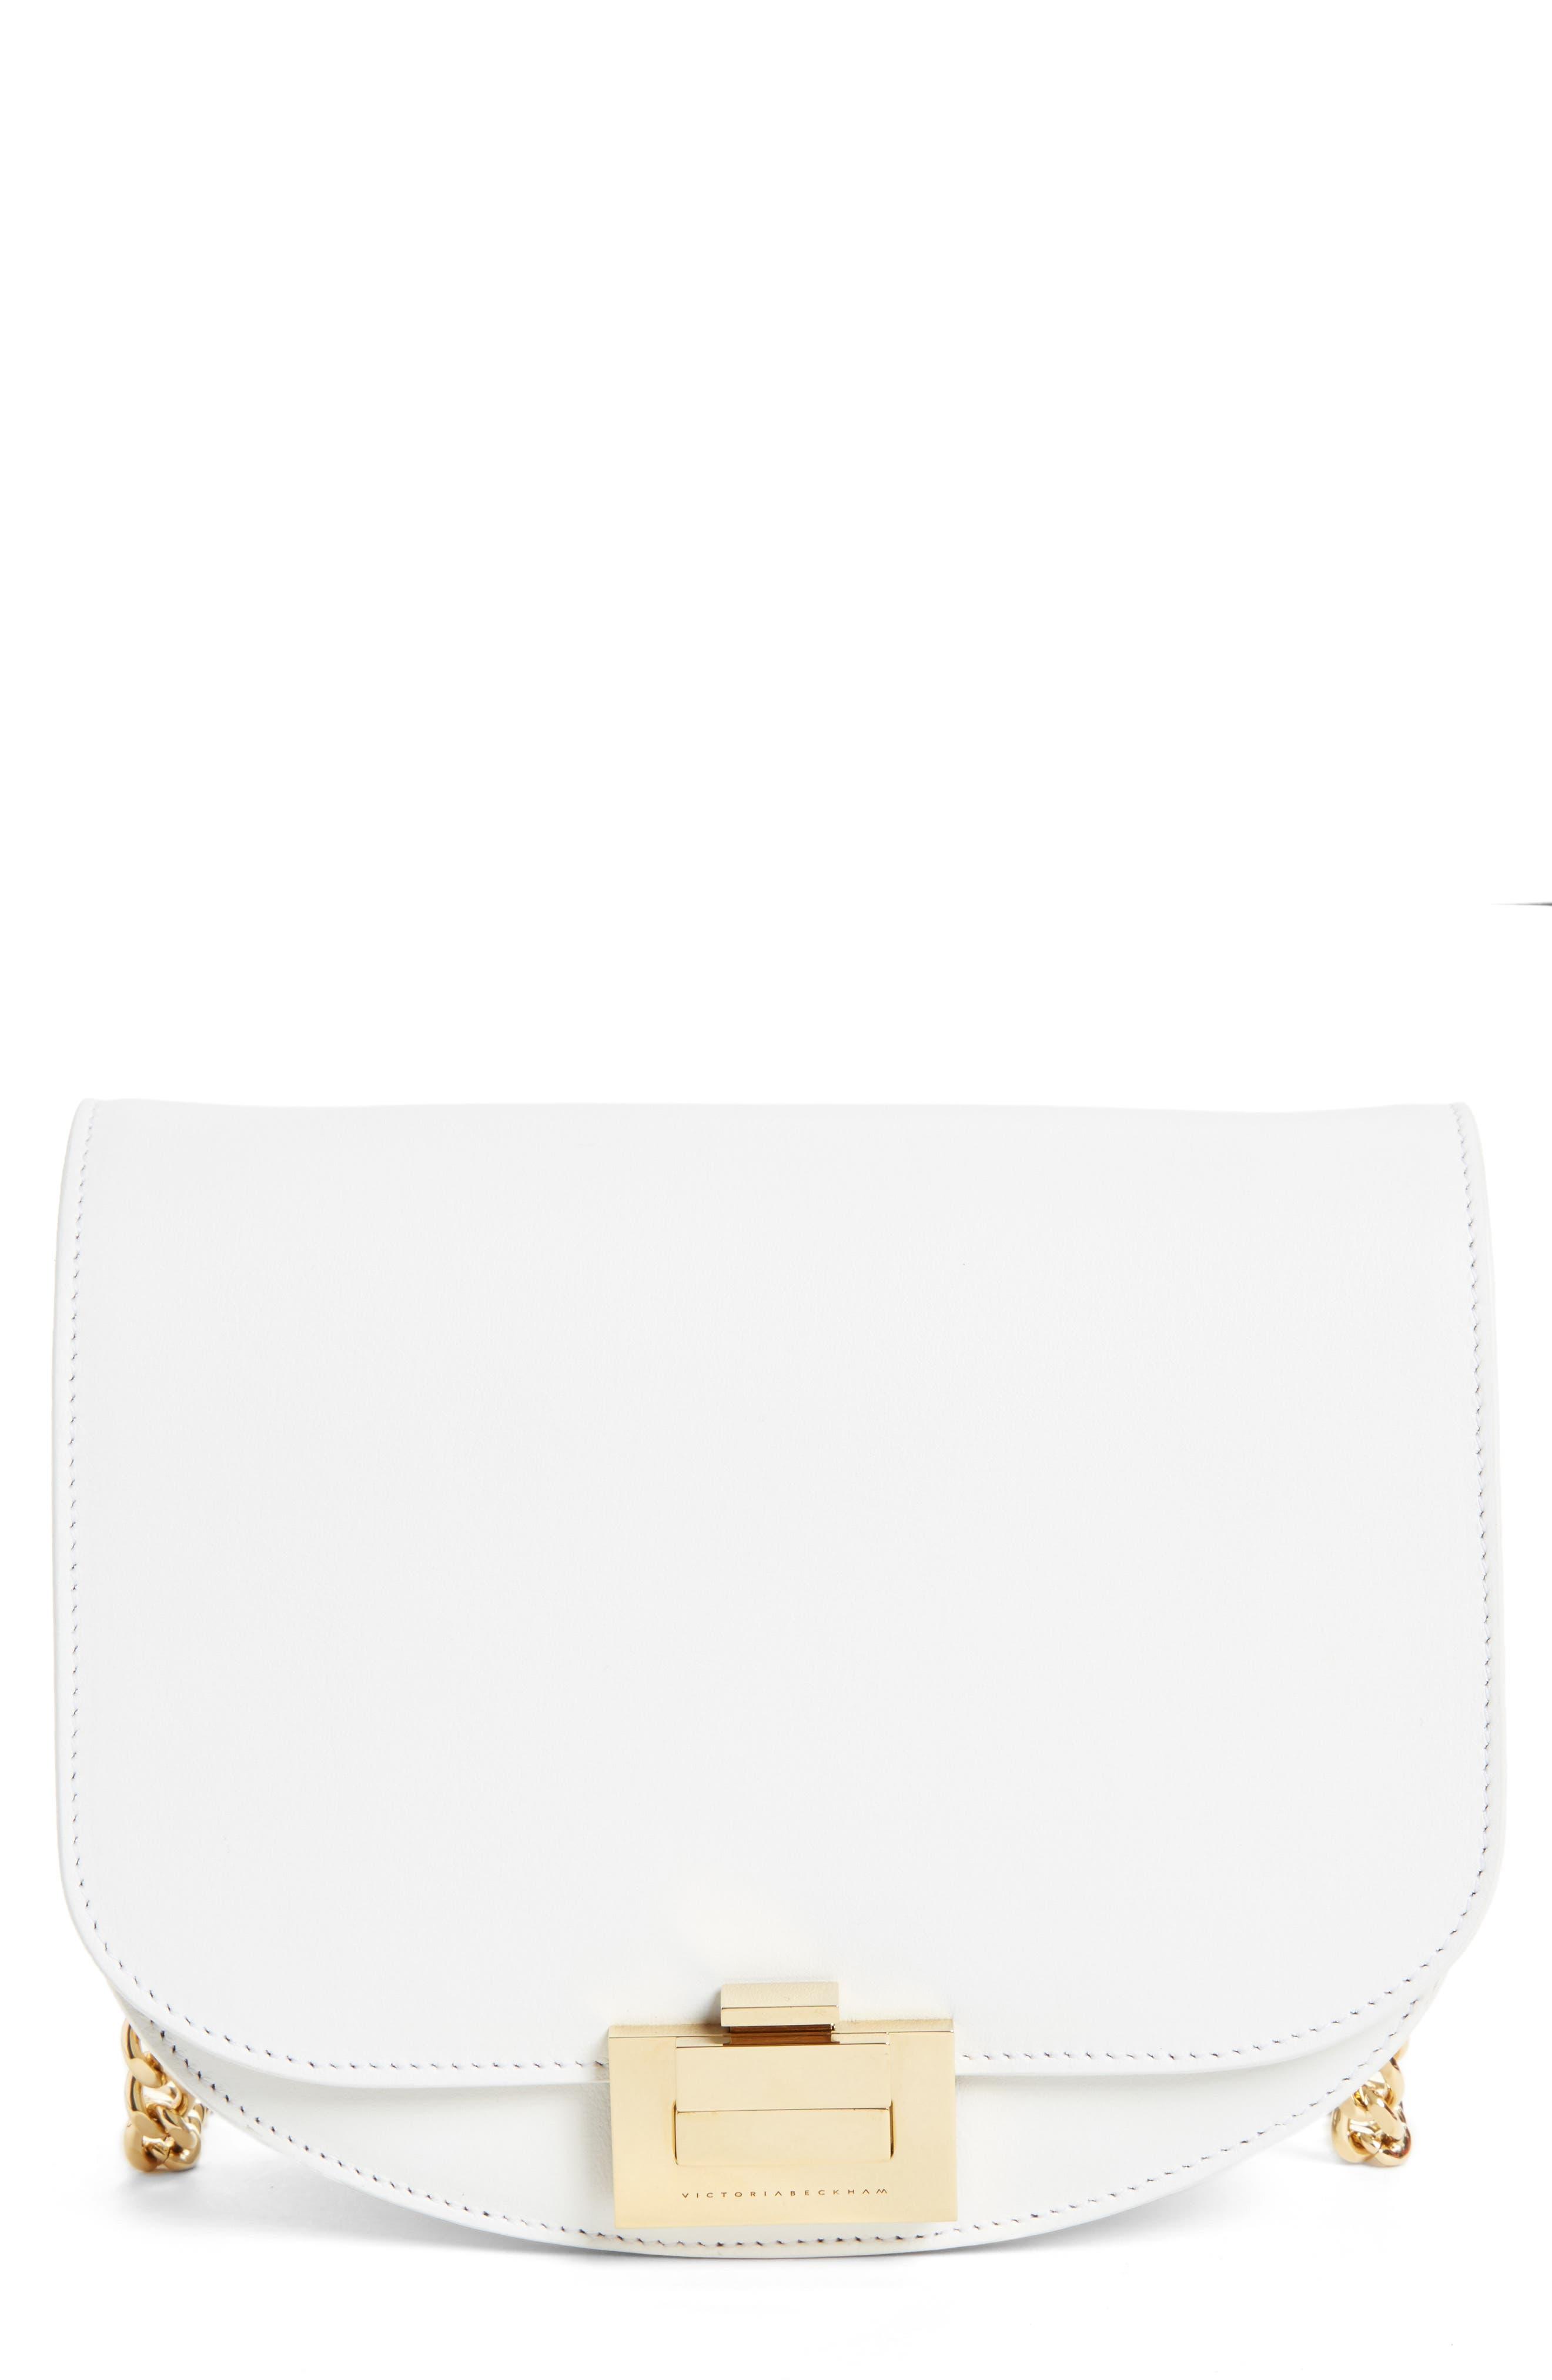 Victoria Beckham Leather Bag